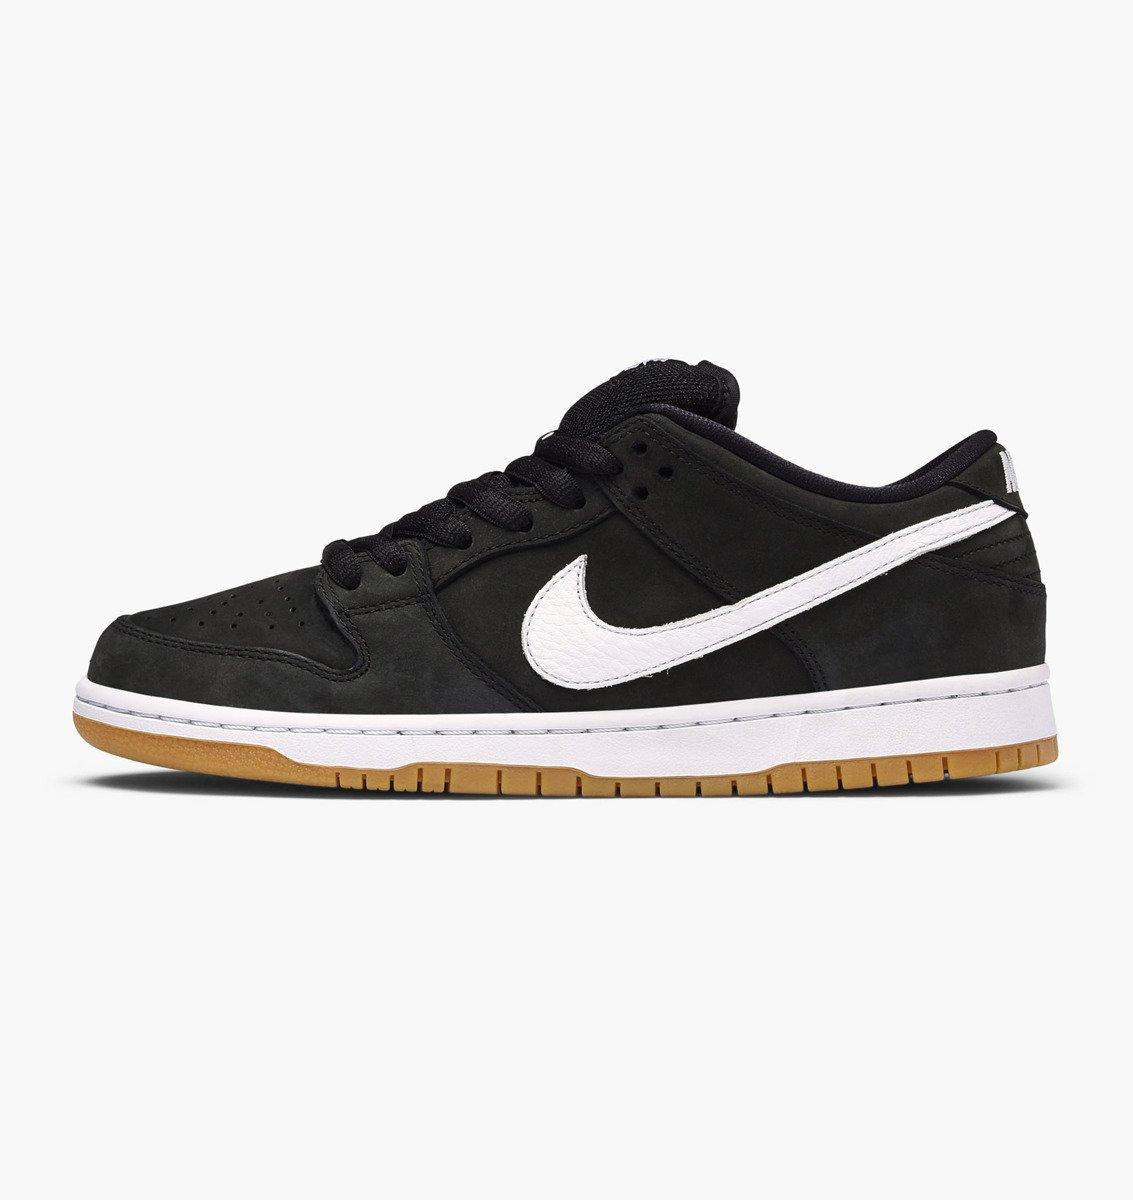 c5fd97cefcce Nike Sb Dunk Low Pro Iso Black white-black black